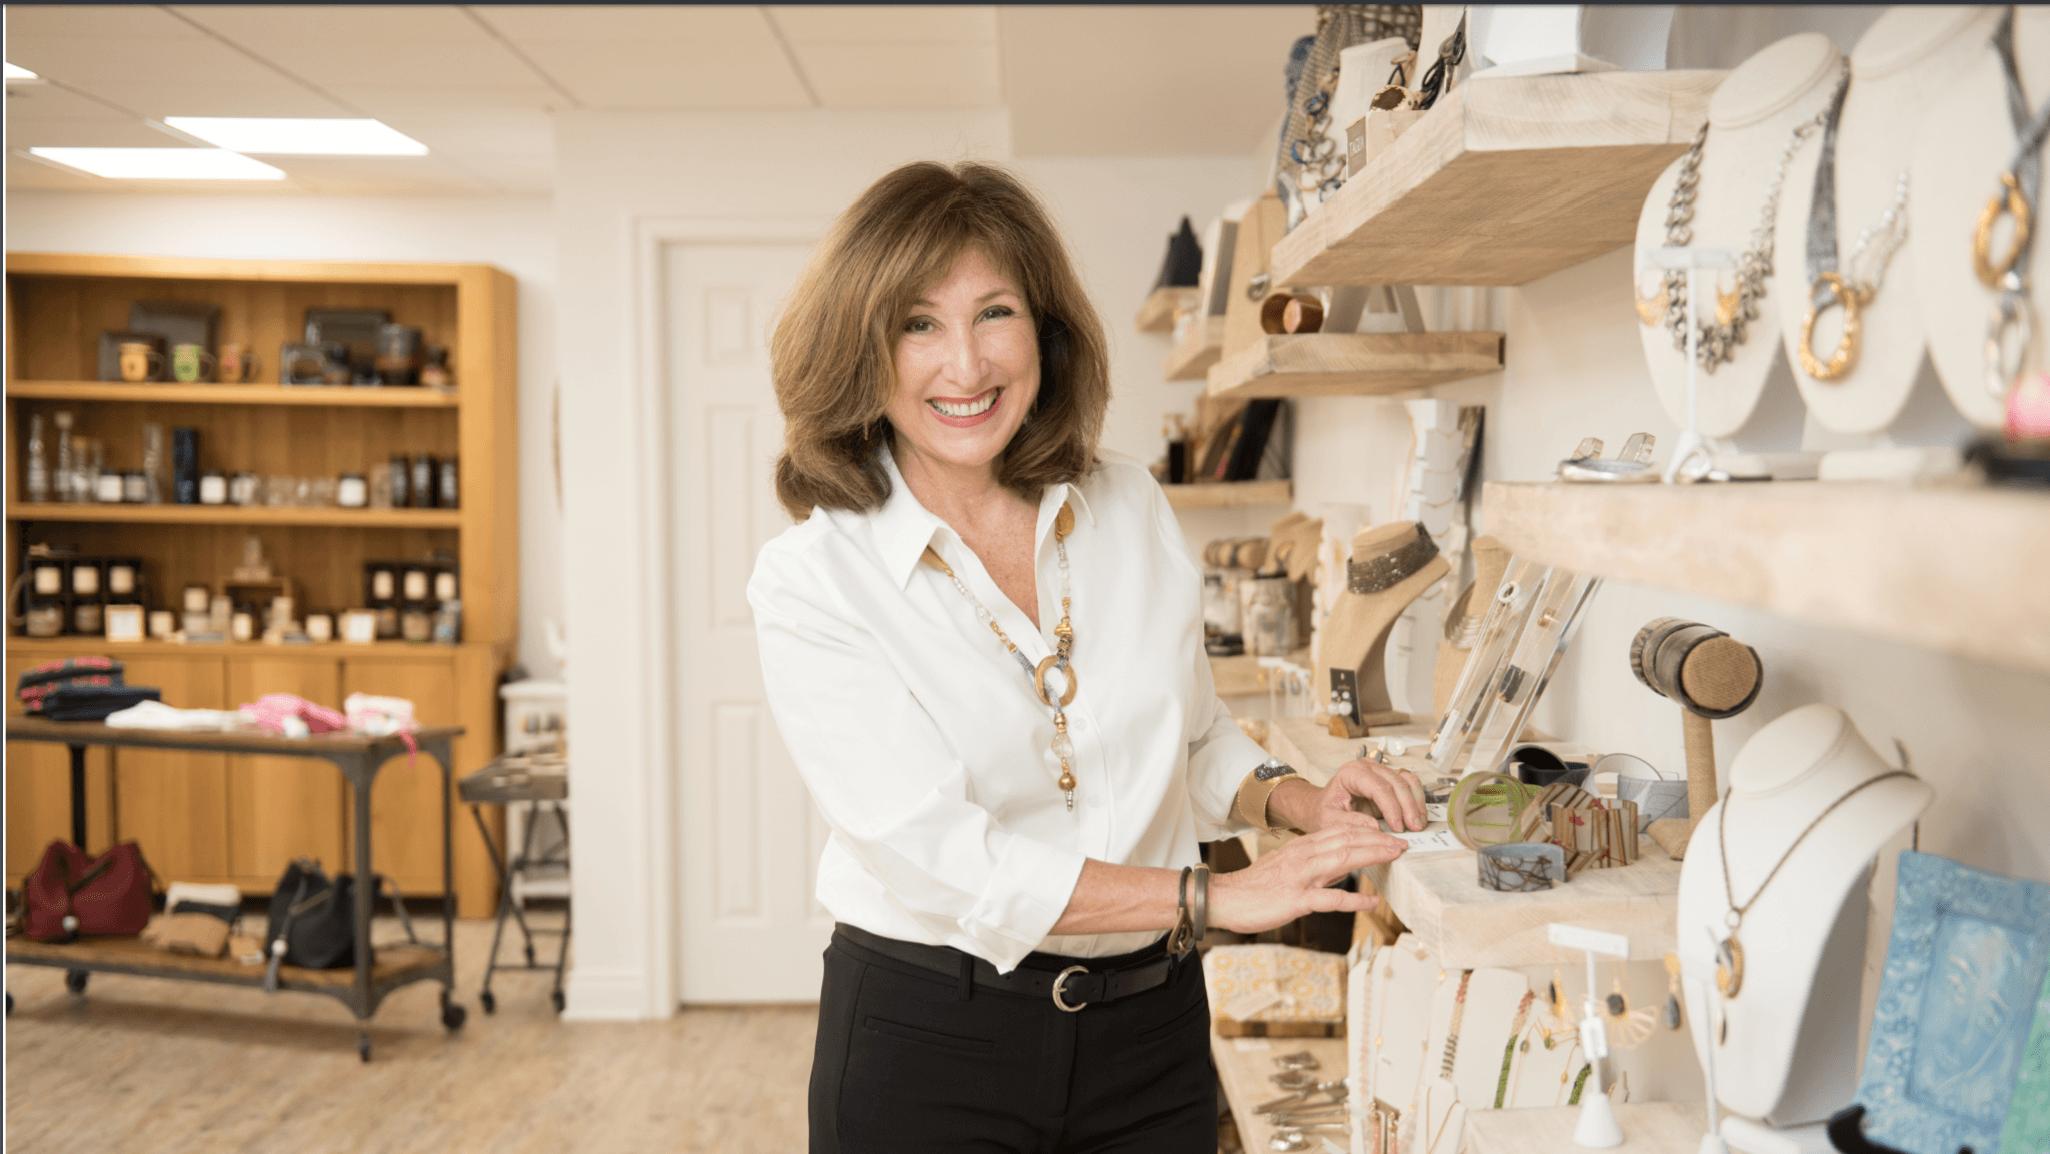 Ellen Eppie's 'Scooch A Mi' Boutique Spreads Mindful Kindness